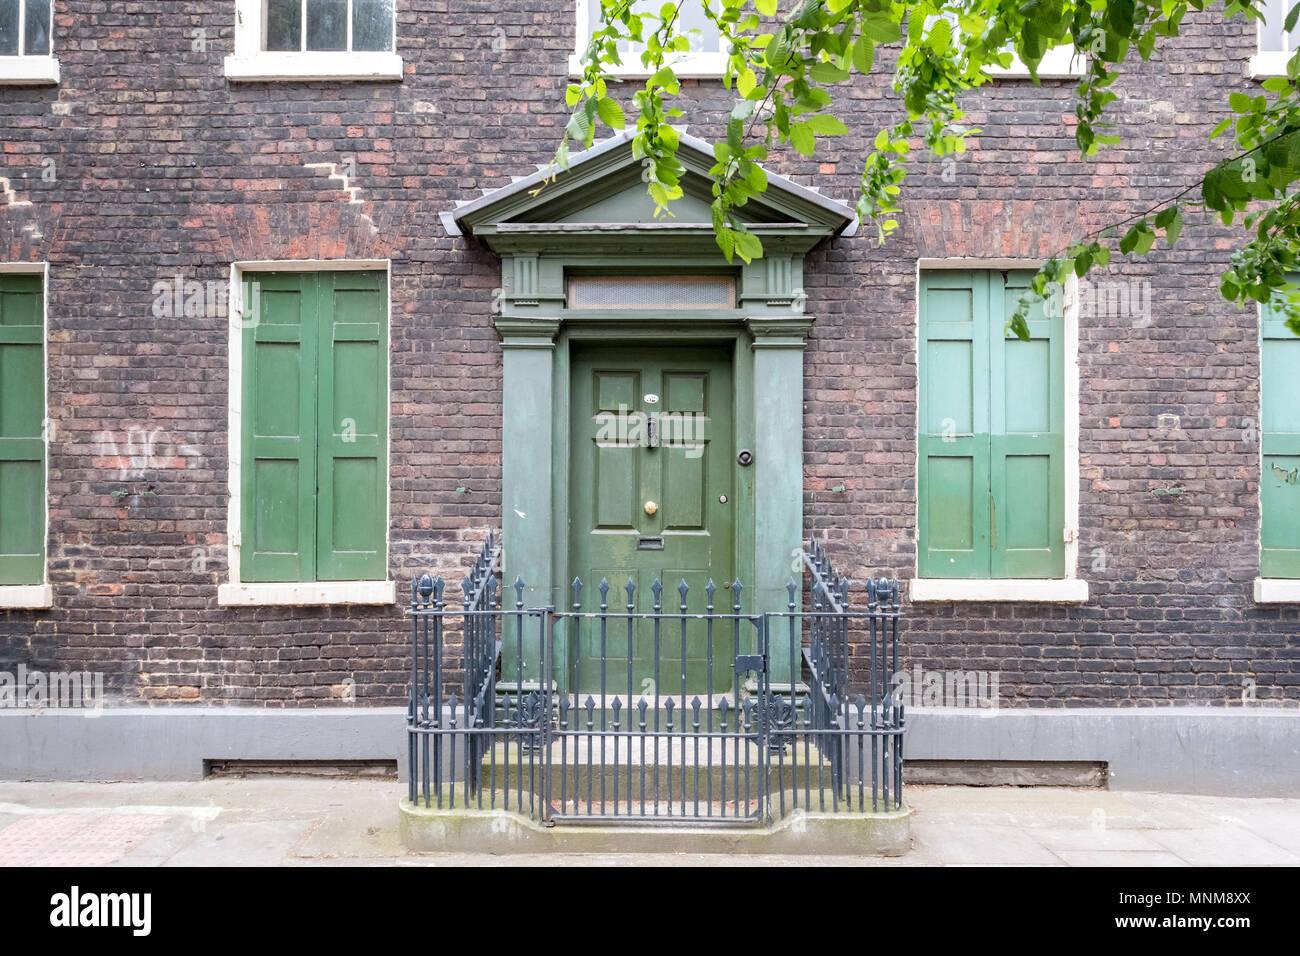 Couleur Façade Maison Ancienne brick house old facade detail shutters photos & brick house